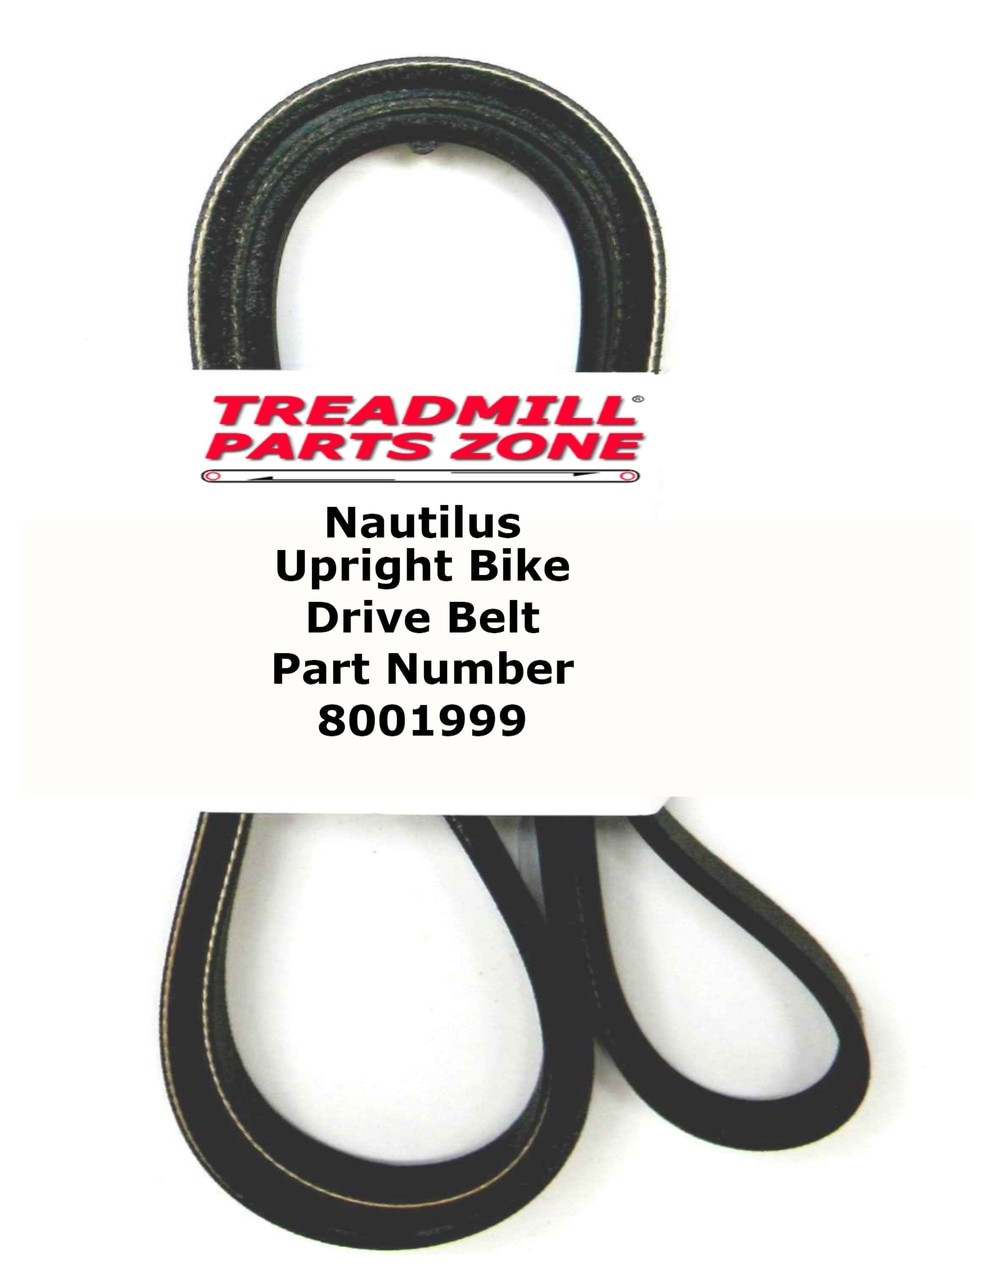 Nautilus Upright Bike Model U686 Drive Belt Part Number 8001999